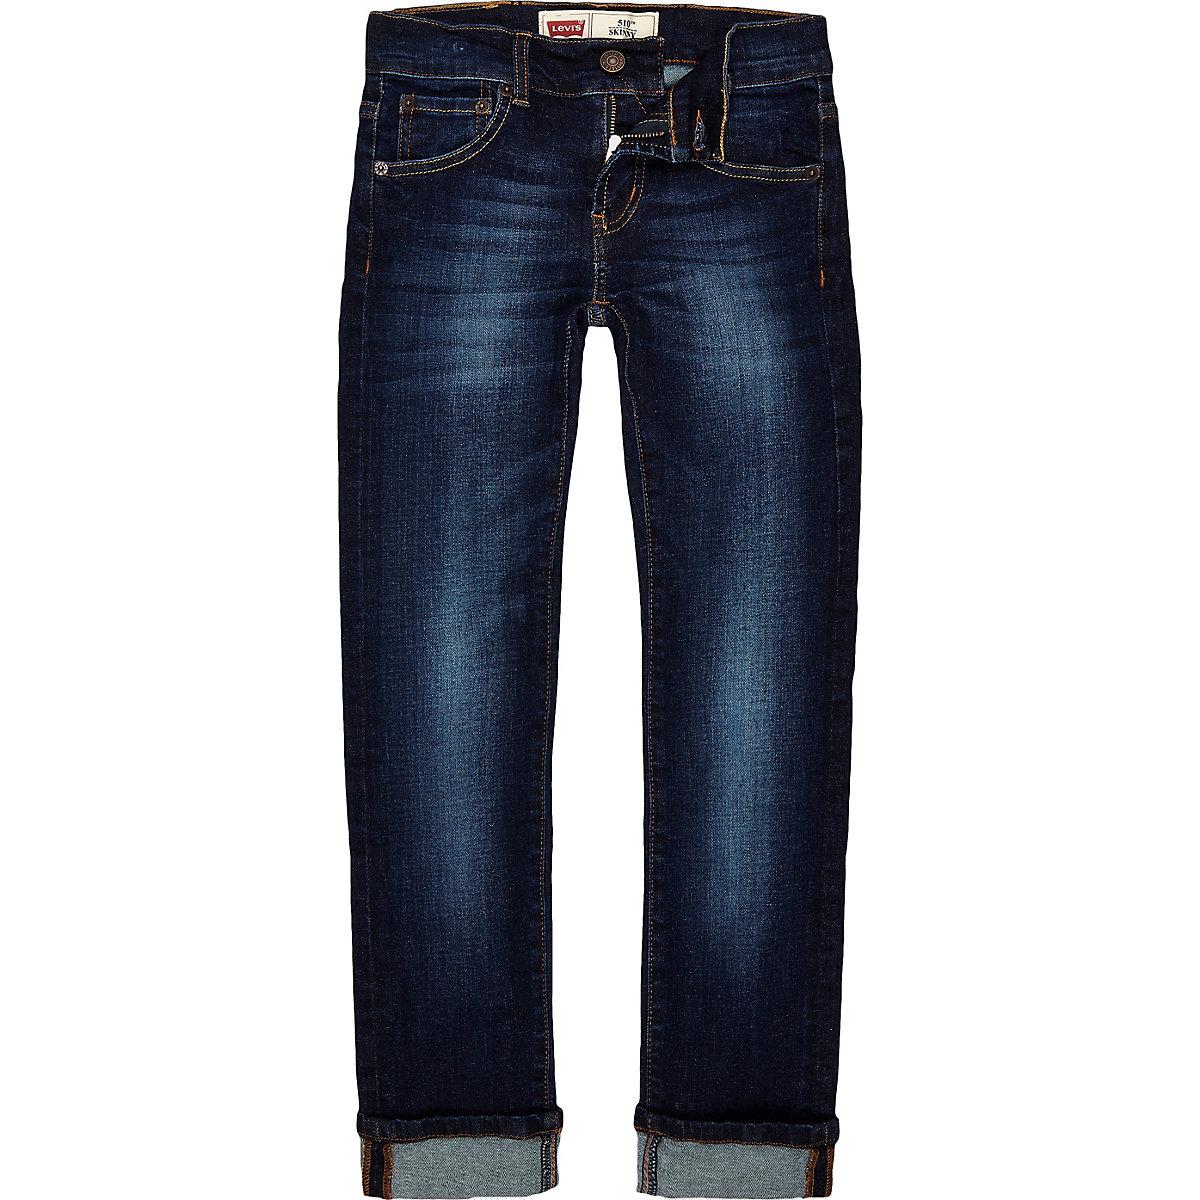 Boys Levi's blue denim jeans